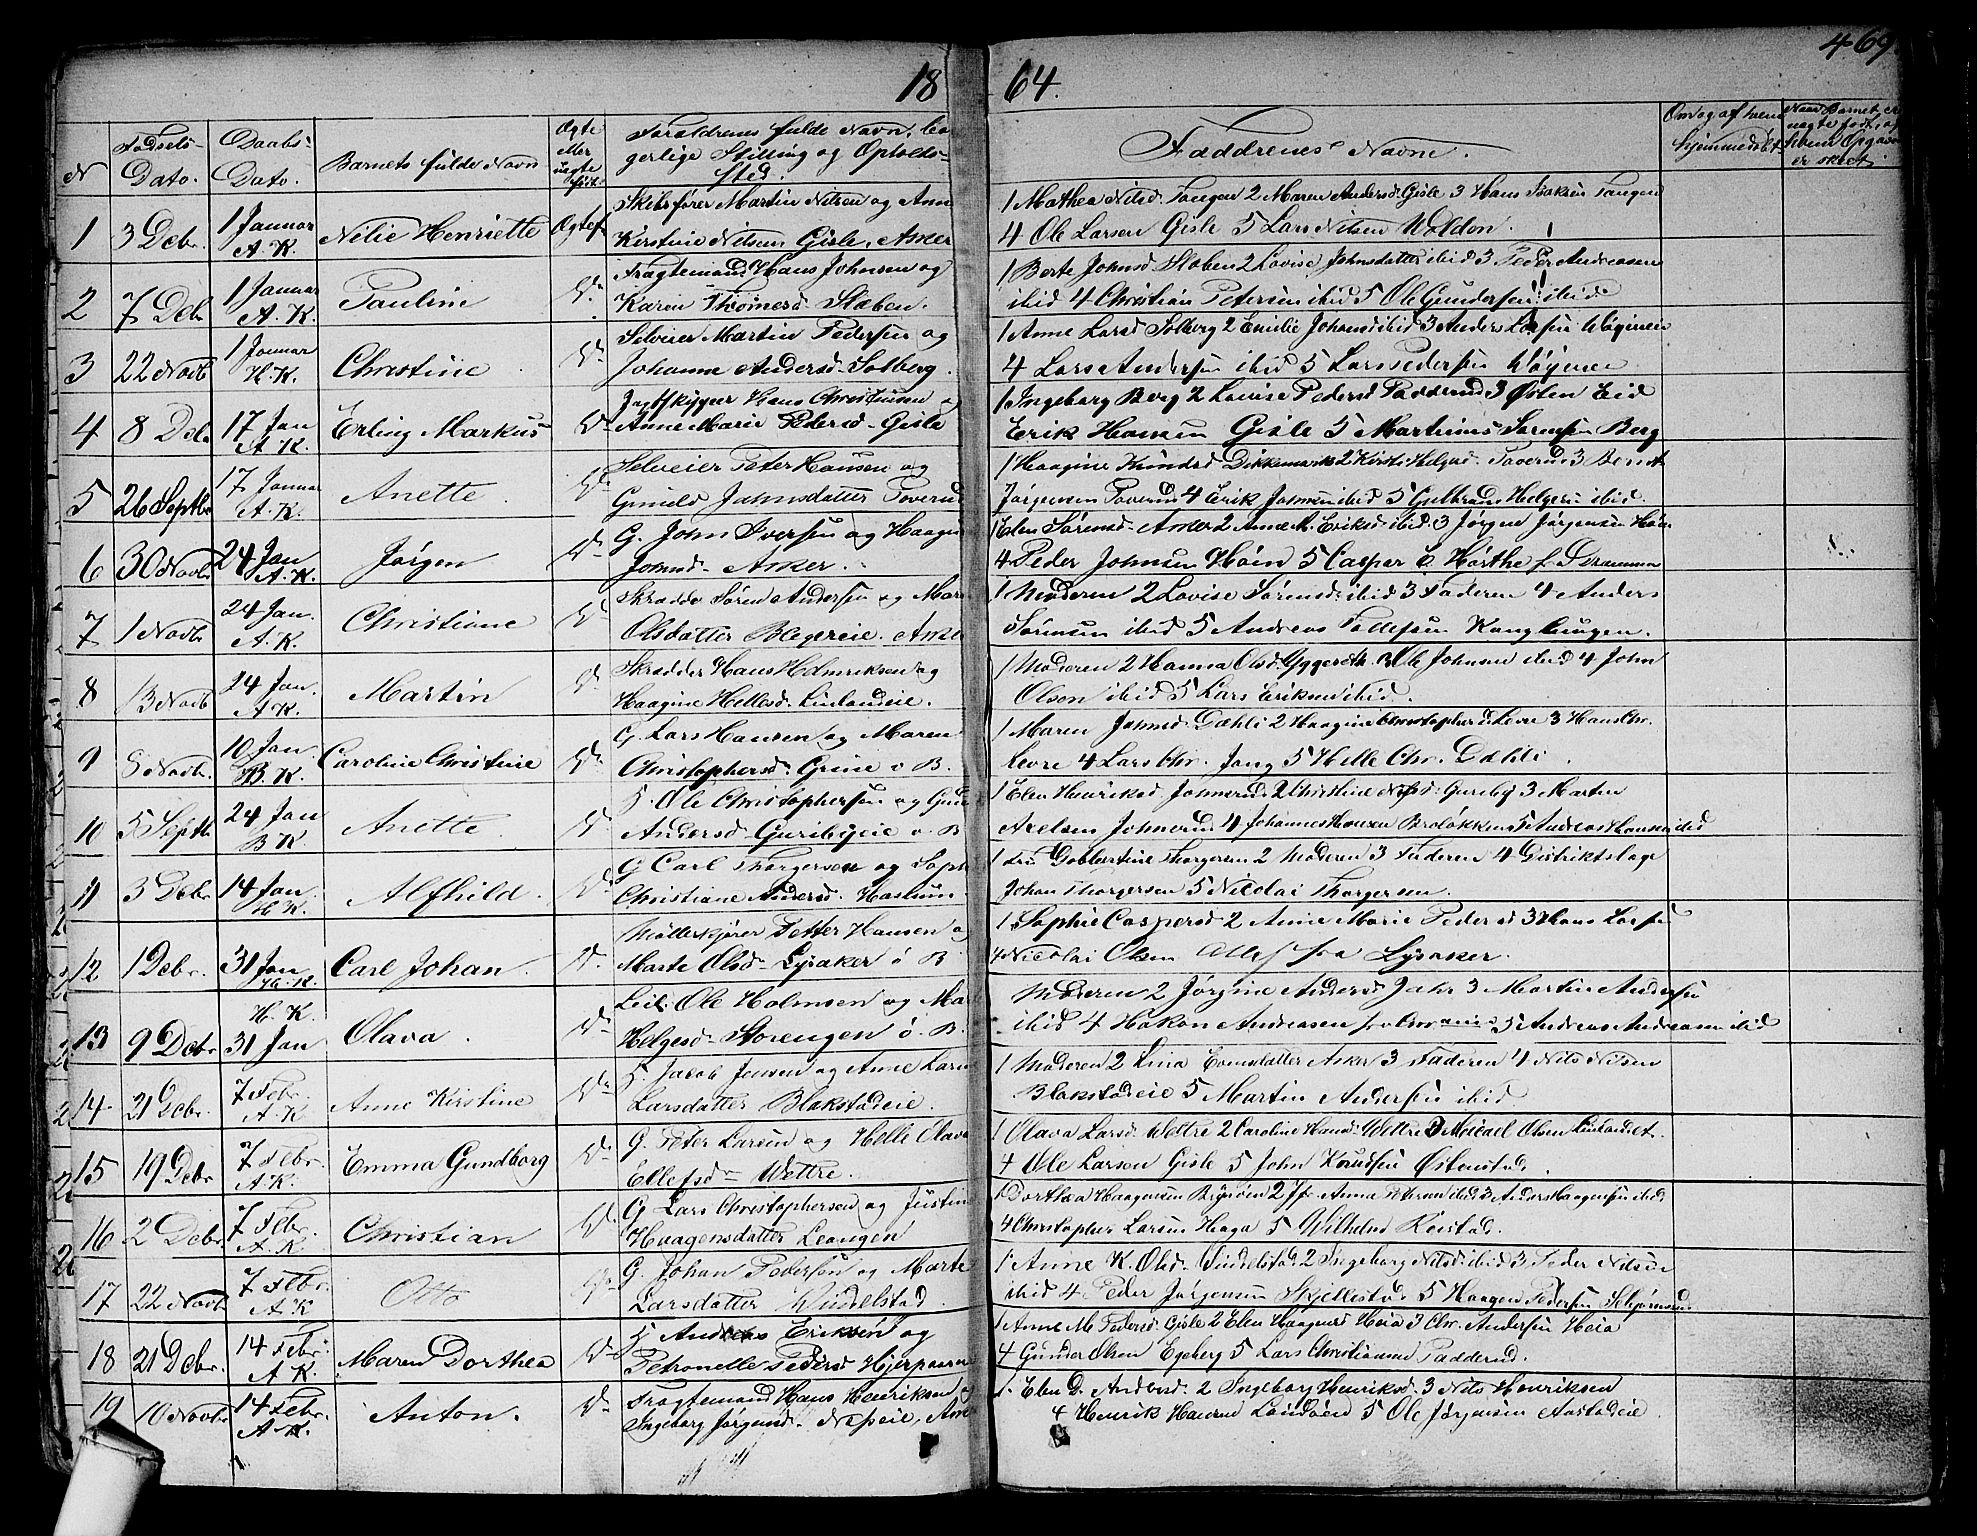 SAO, Asker prestekontor Kirkebøker, F/Fa/L0007: Parish register (official) no. I 7, 1825-1864, p. 469